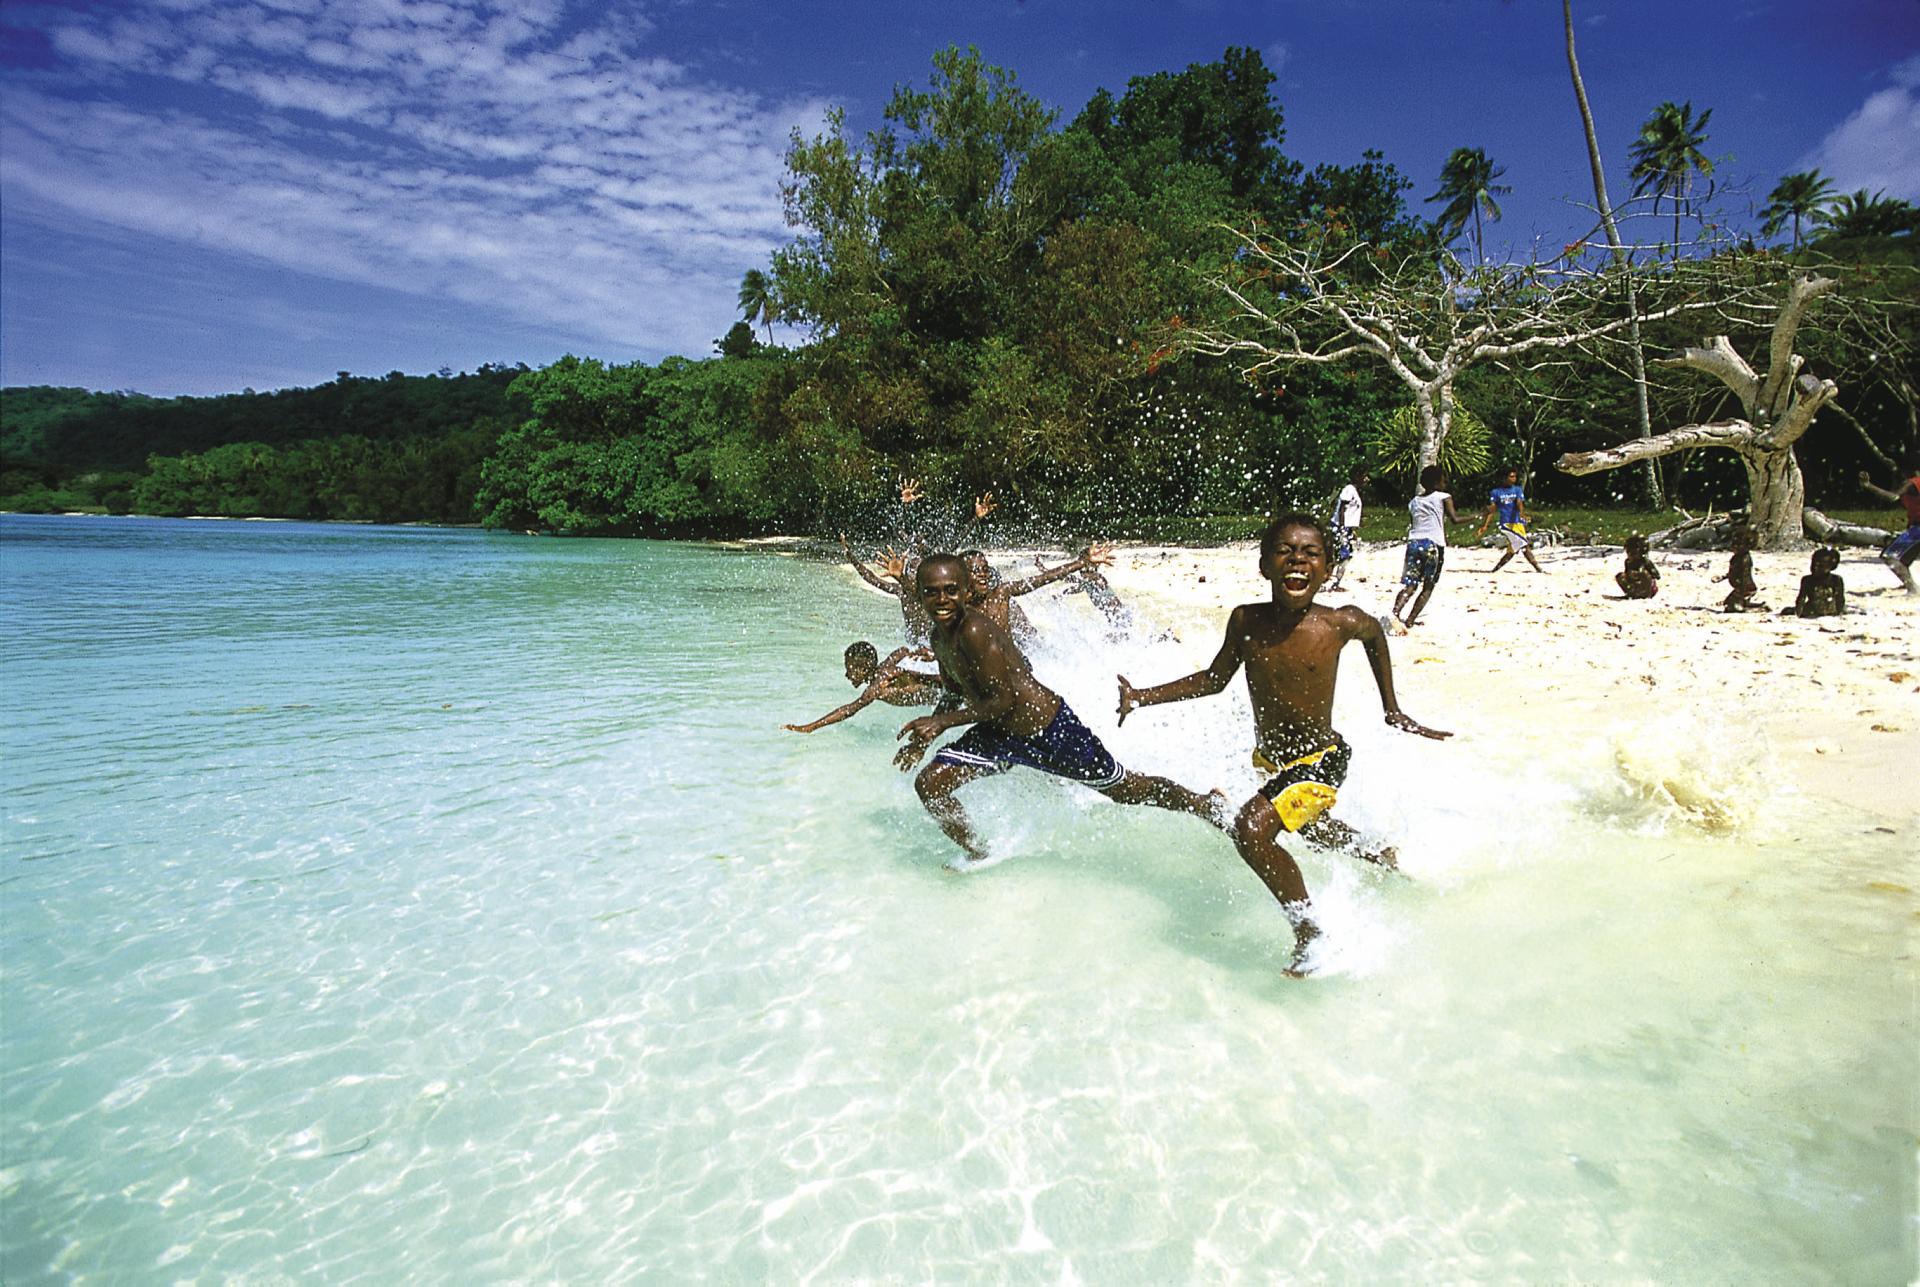 Kinder in Vanuatu